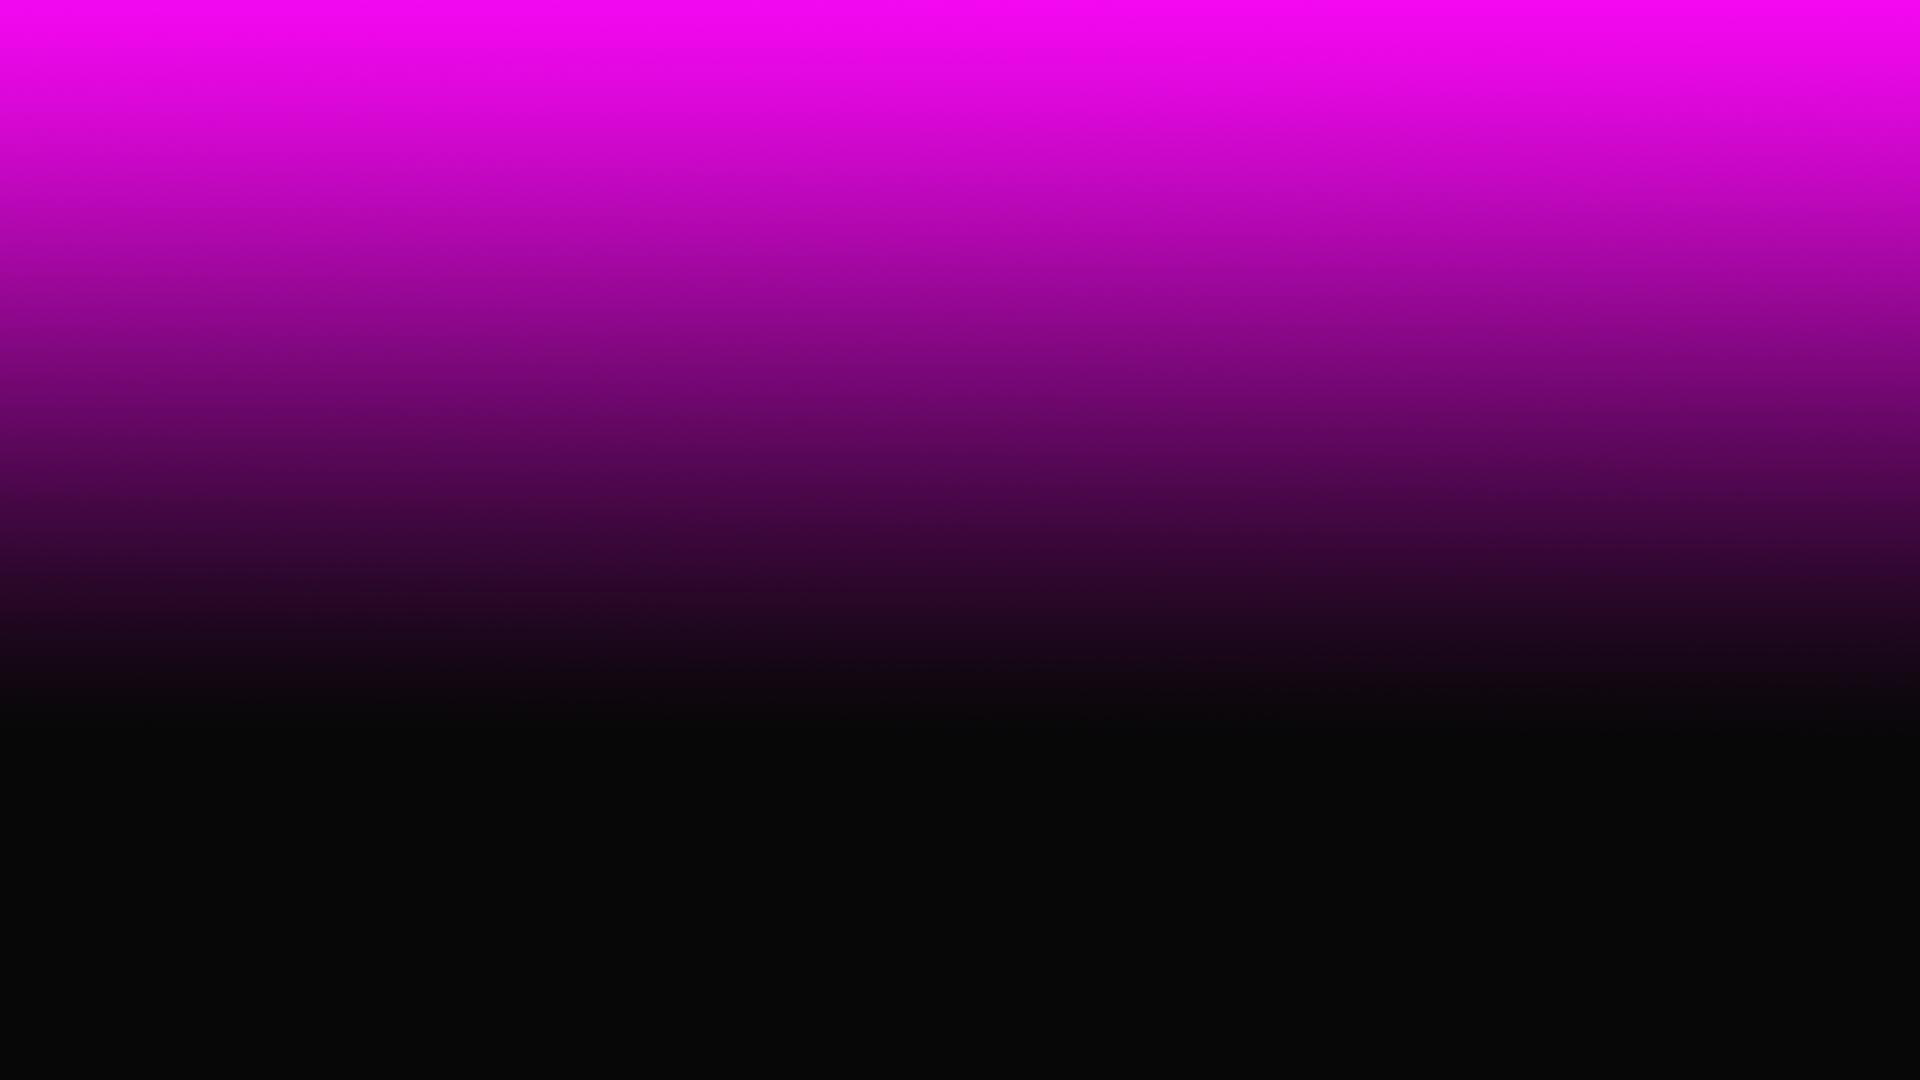 Black And Pink Wallpaper  45 Free Hd Wallpaper